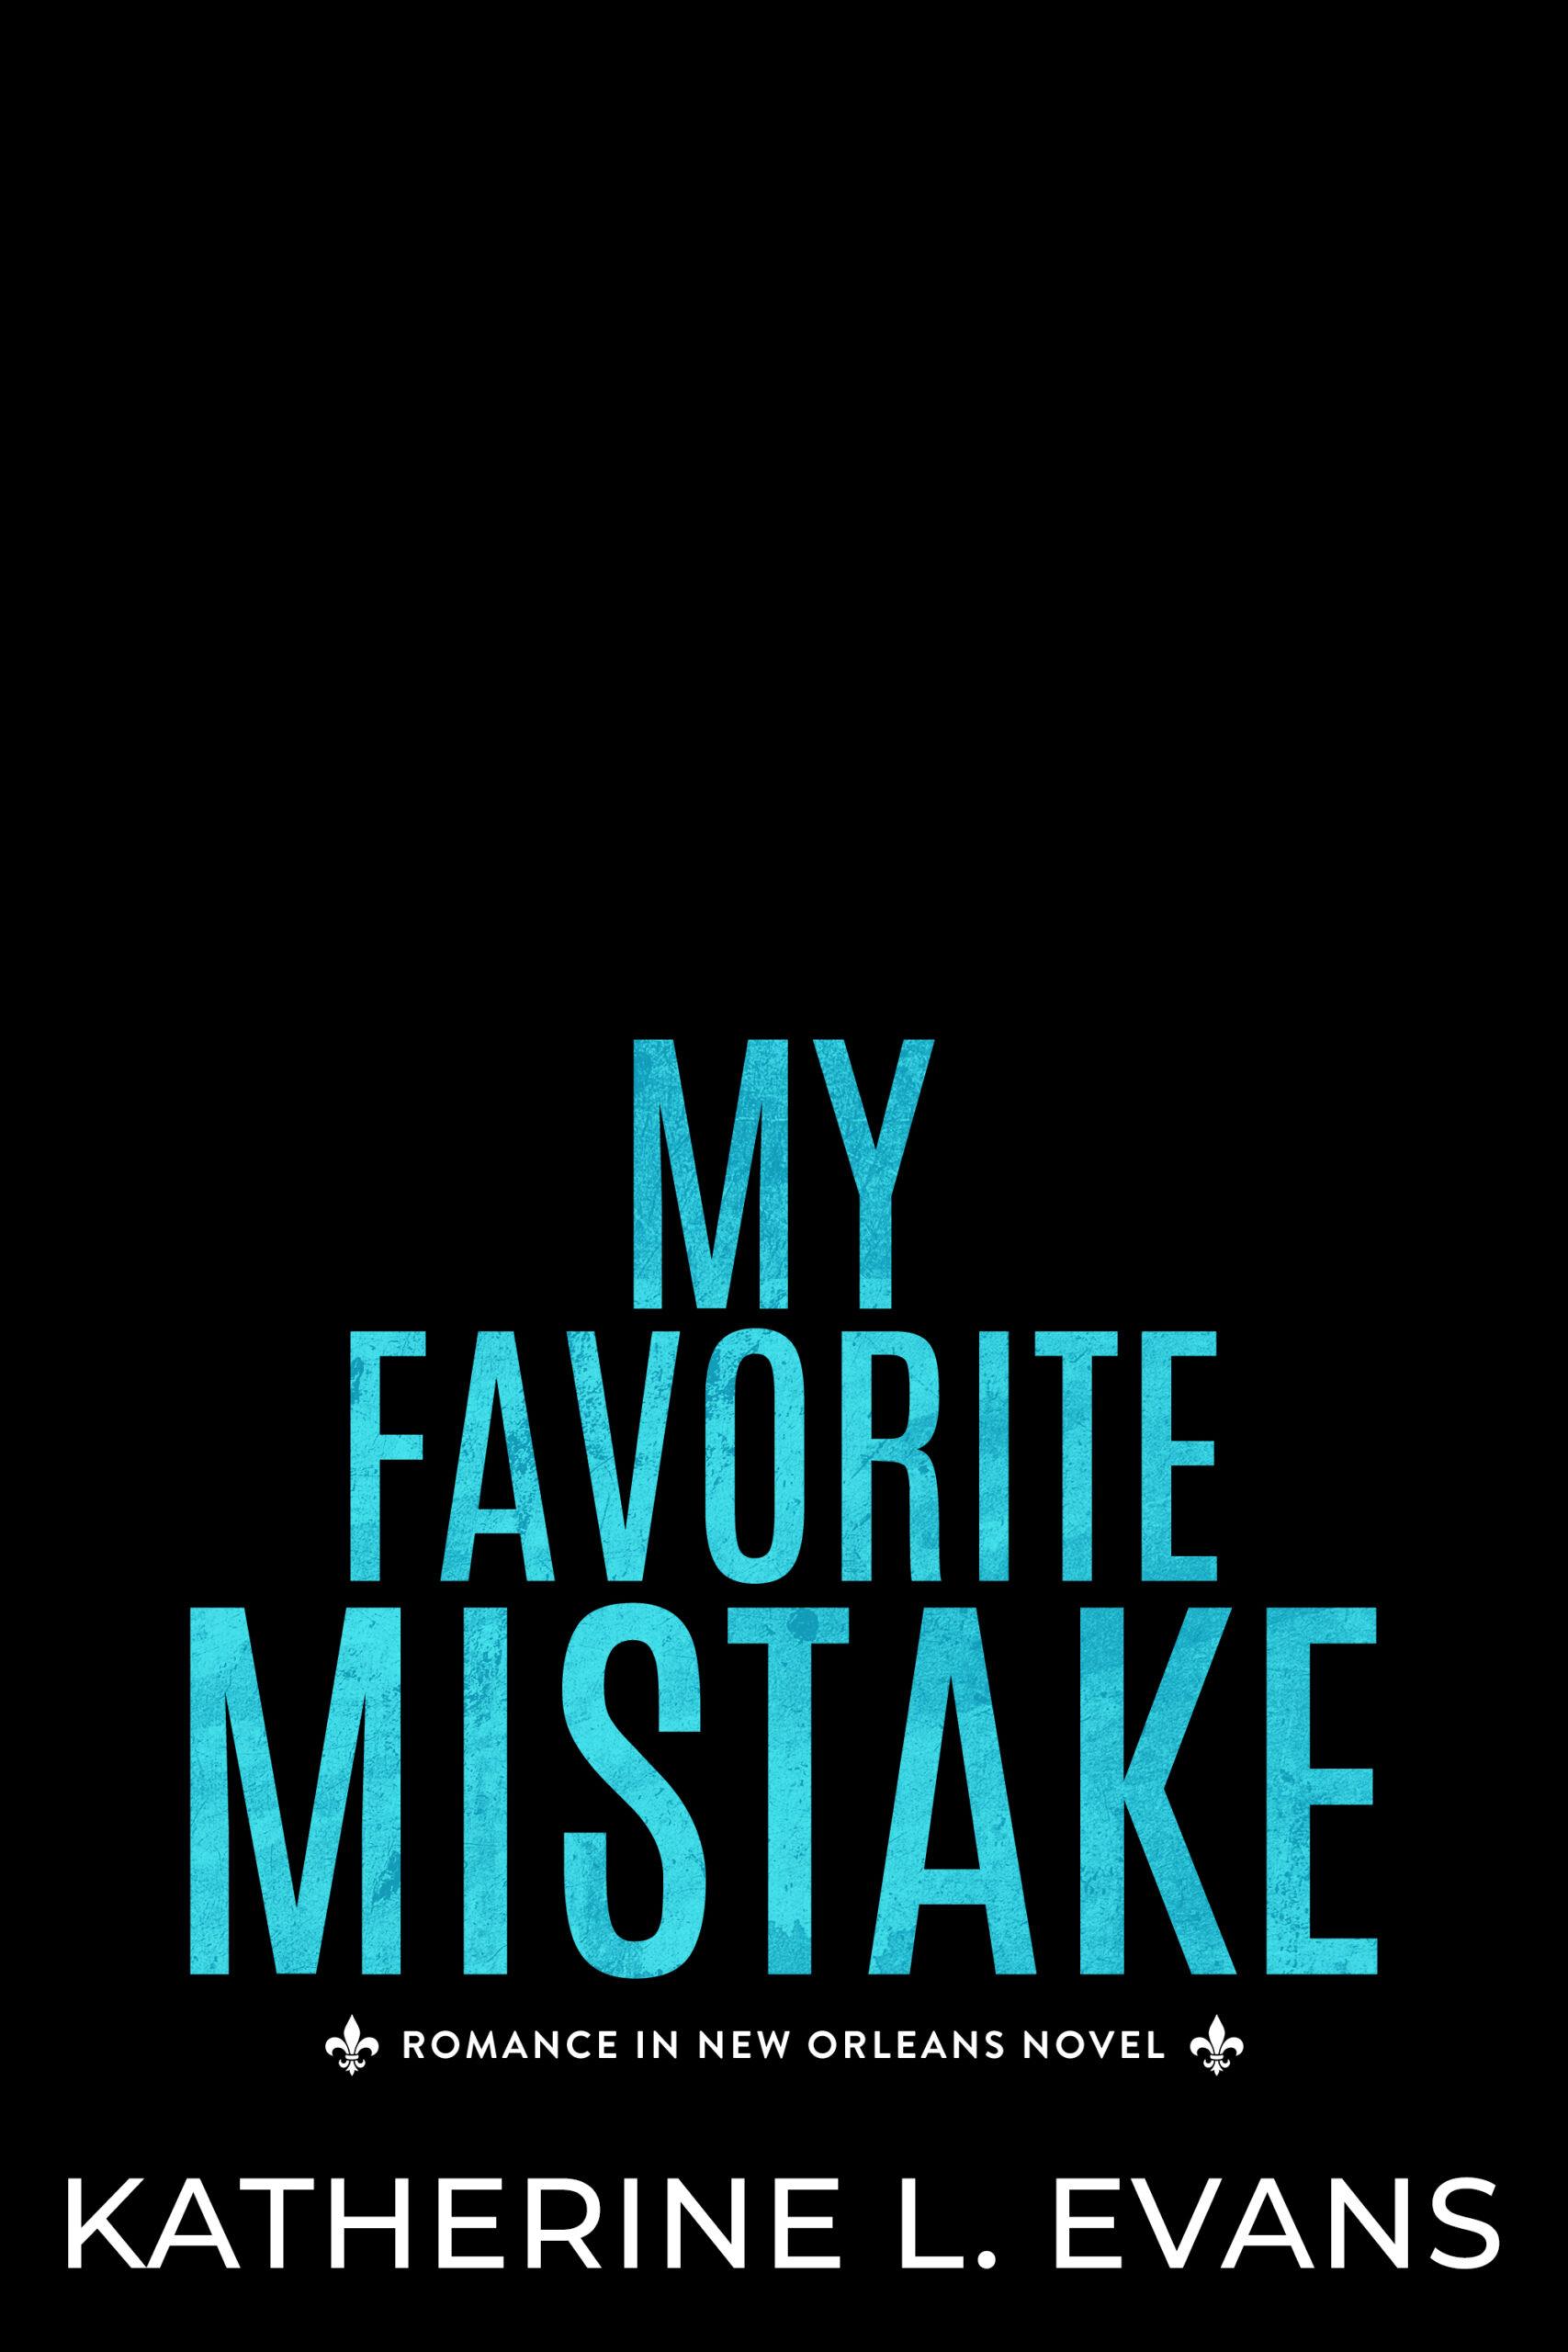 My-Favorite-Mistake_placeholder.jpg